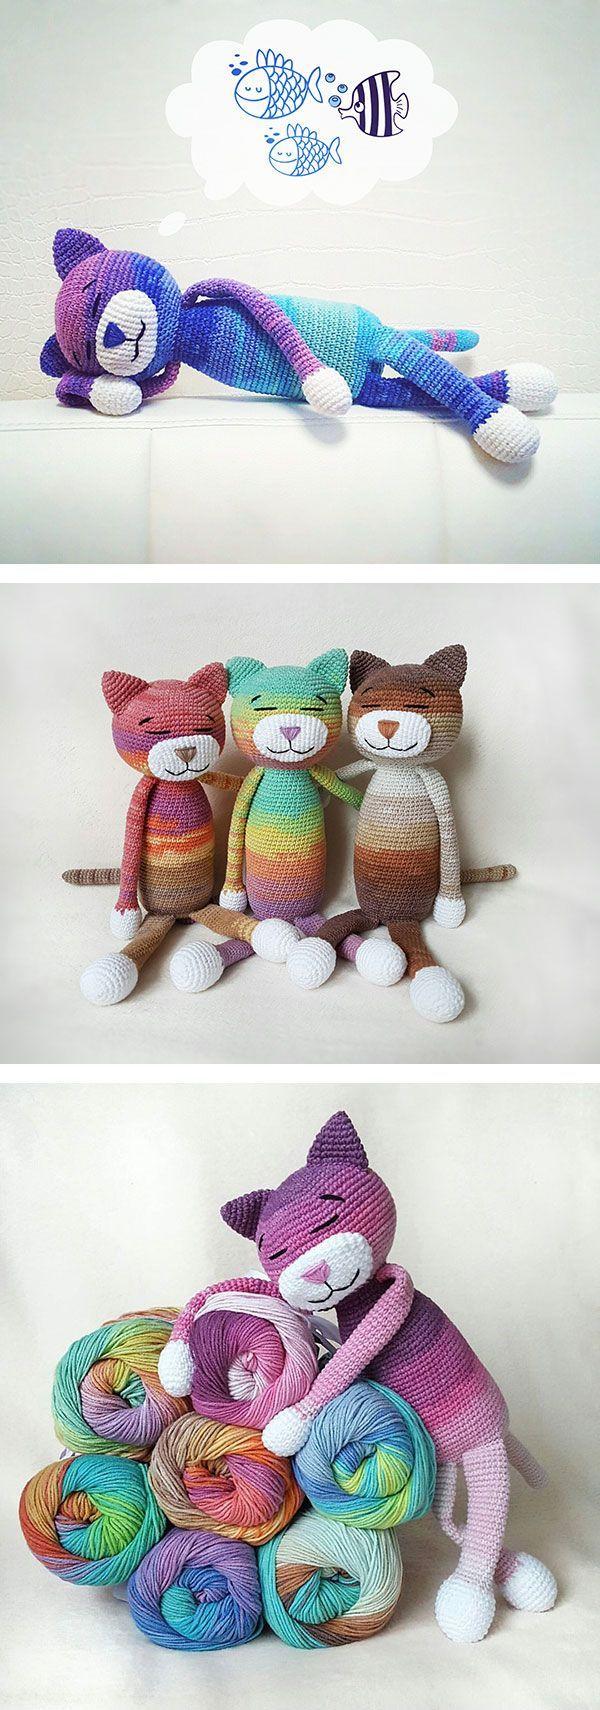 Yarn Yard Amigurumi Tutorial : The 124 best images about Free Amigurumi Crochet Patterns ...